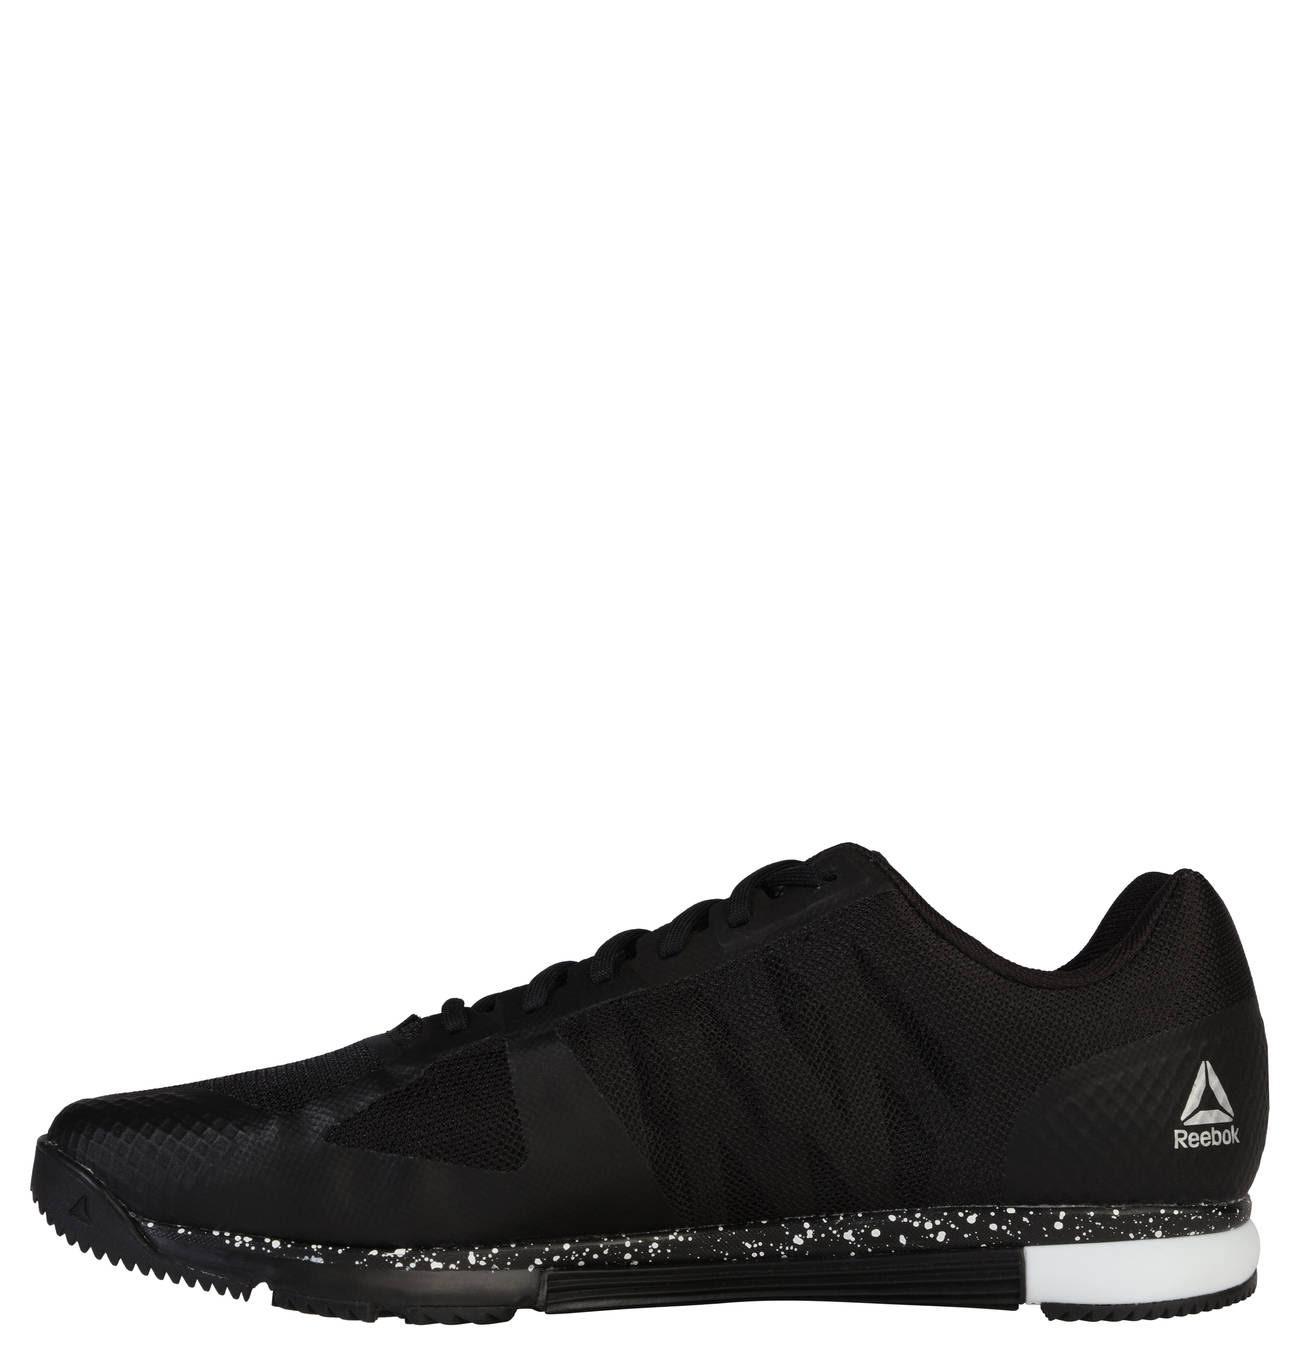 40 Black 5 Crossfit Größe Speed 20 Cn1010 white Schuhe Tr Reebok xZ01zgqA